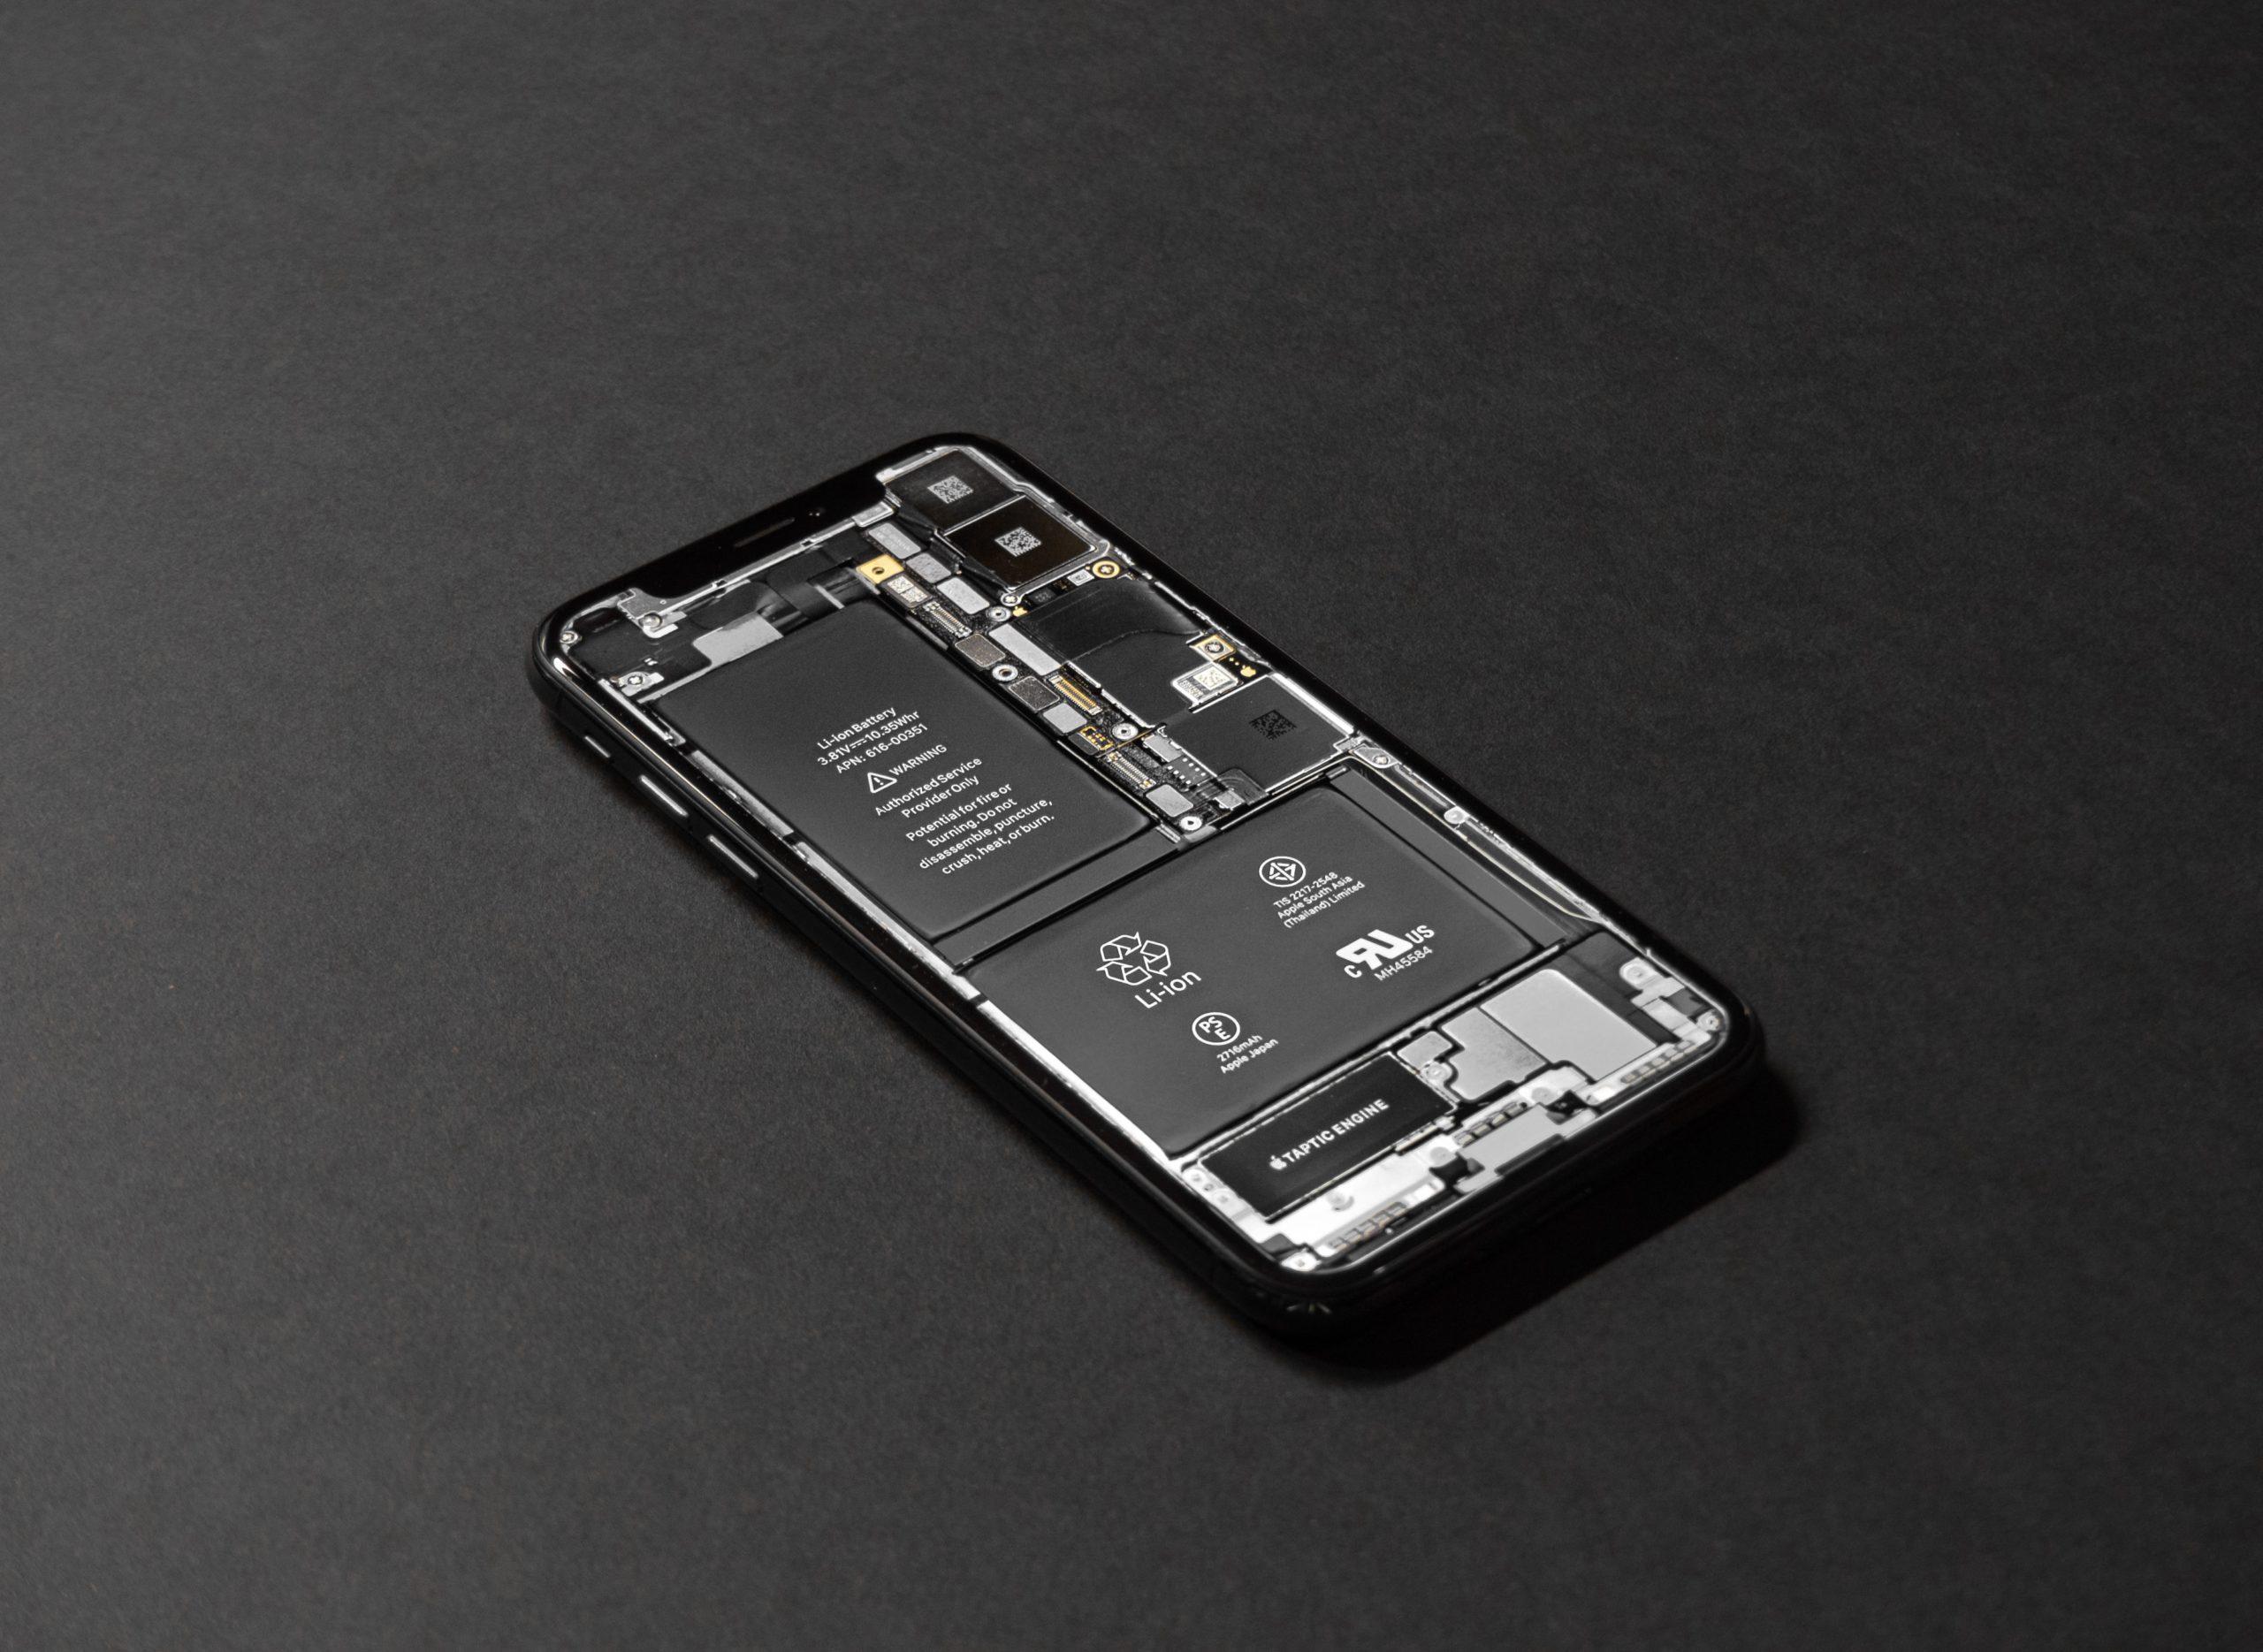 Baterie iPhonu